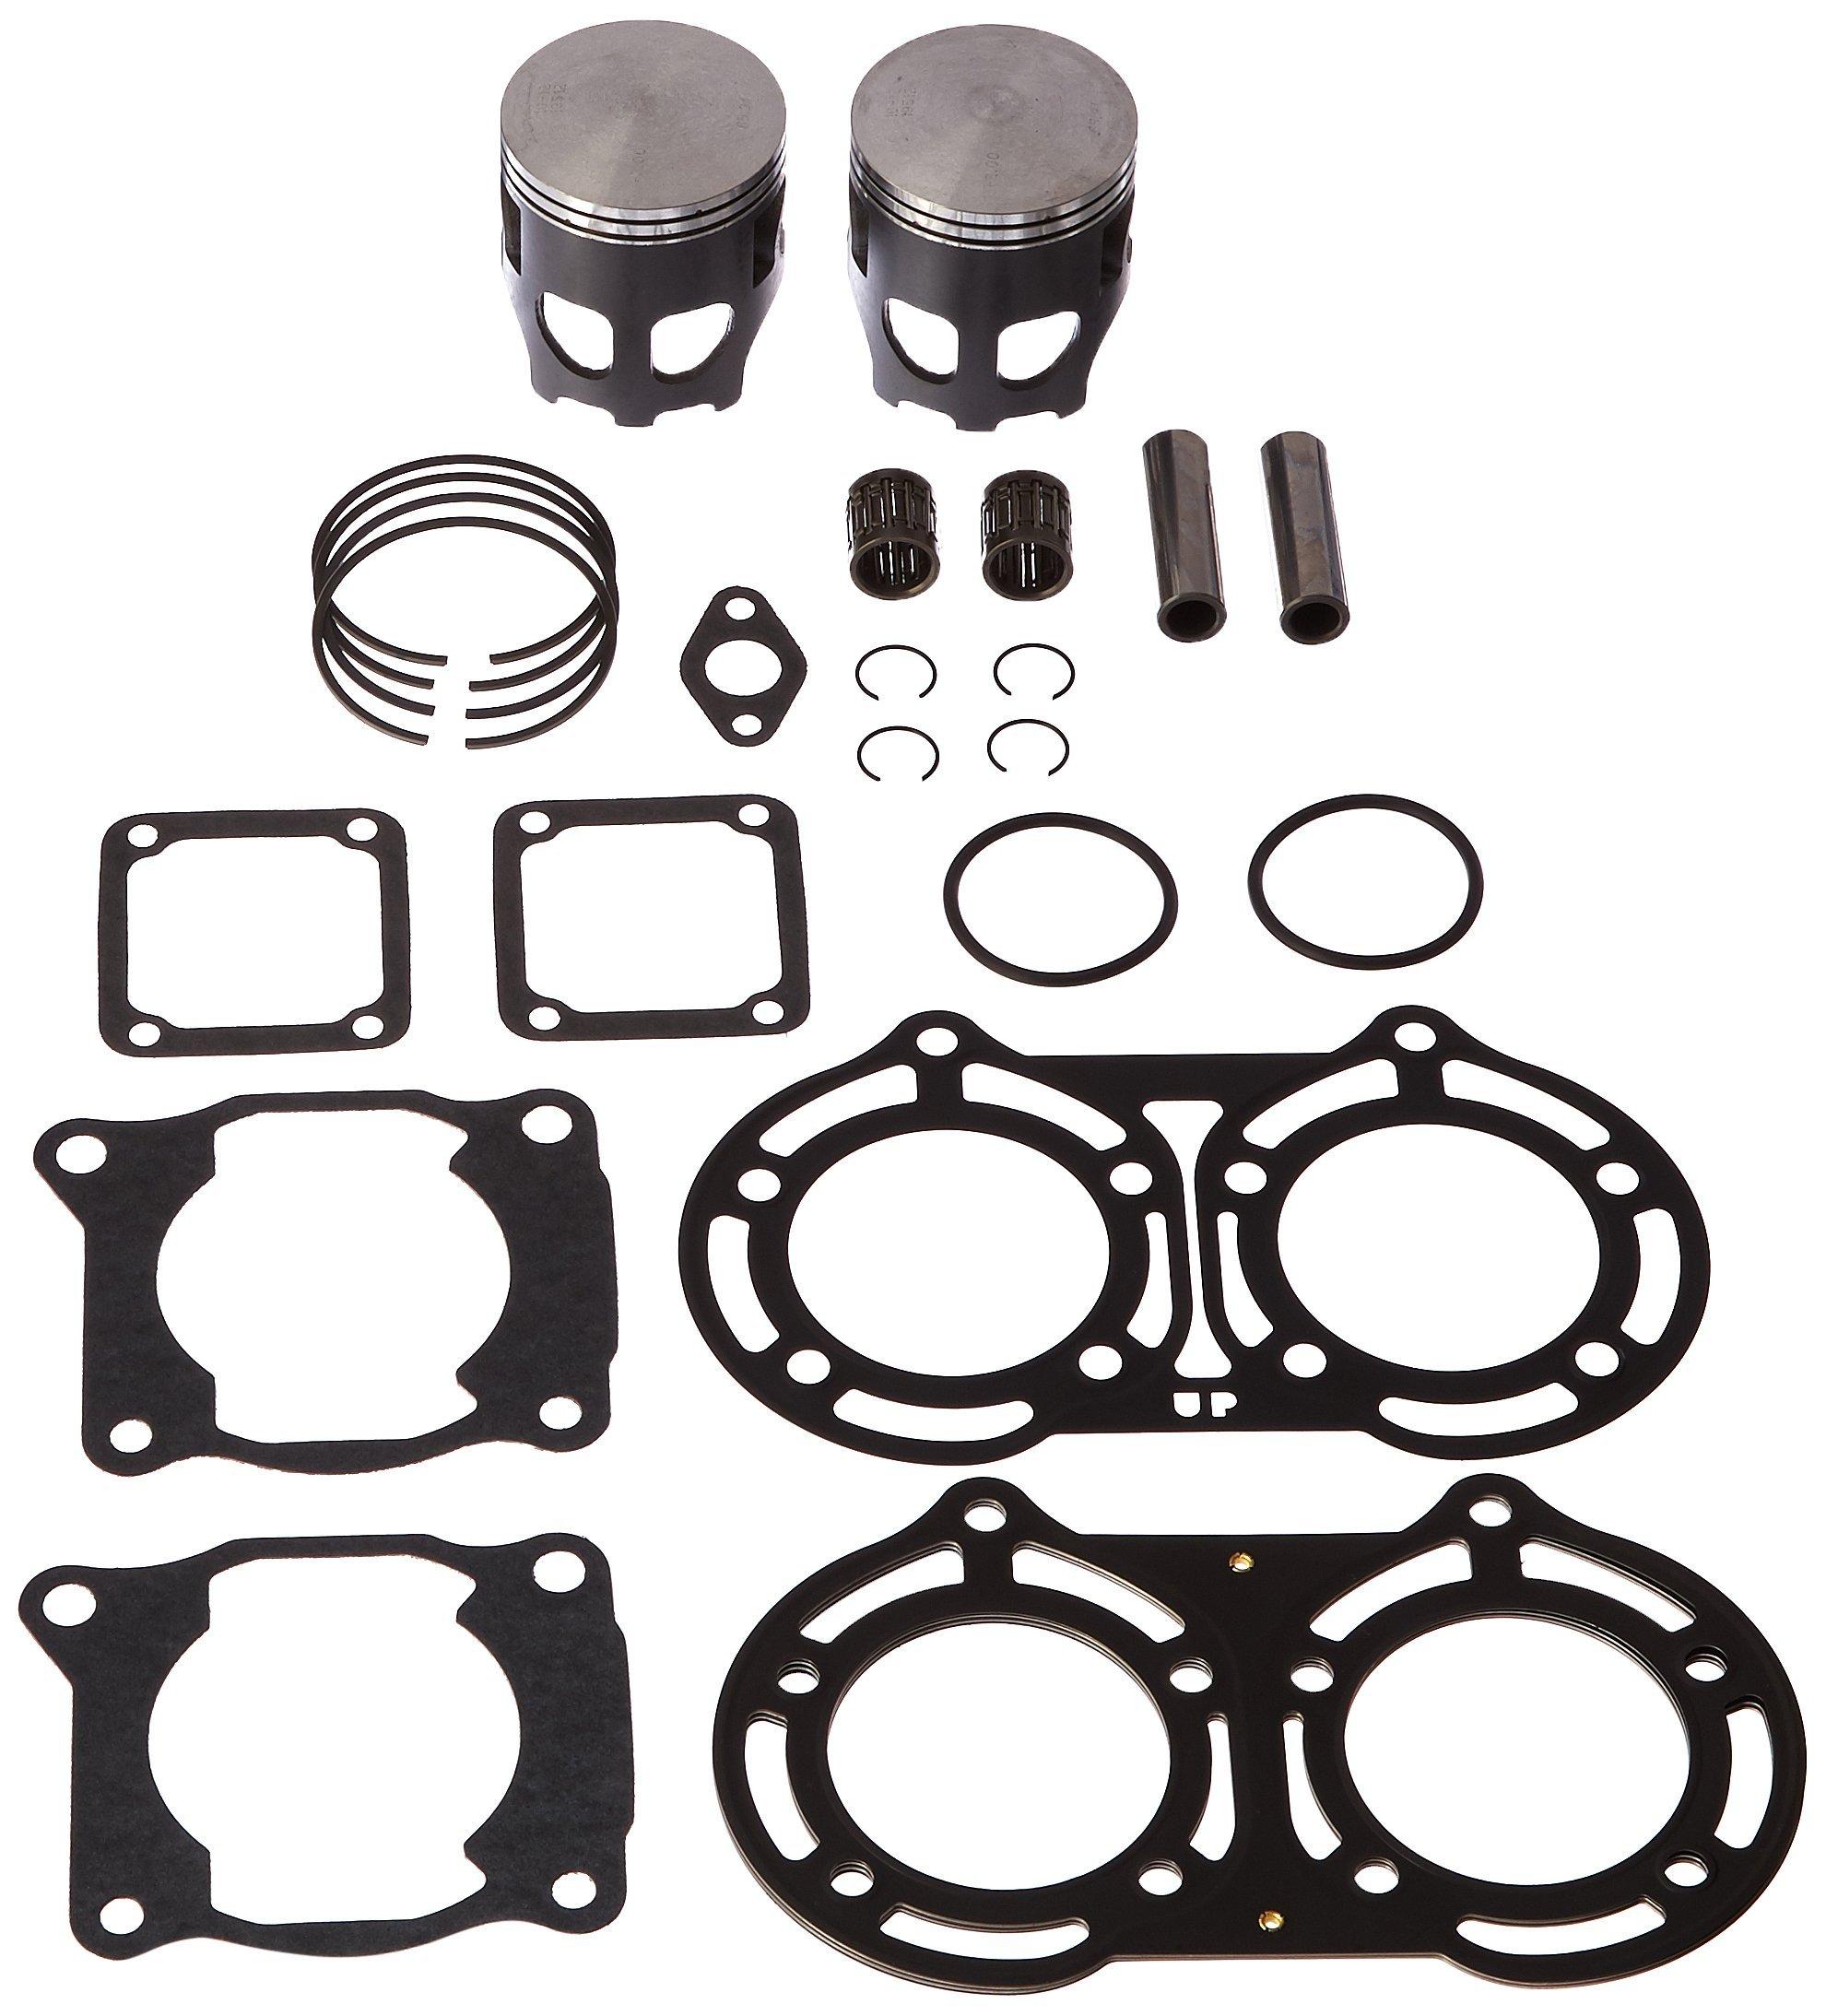 Vertex VTK23607200 Cast Long Rod Top End Piston Kit